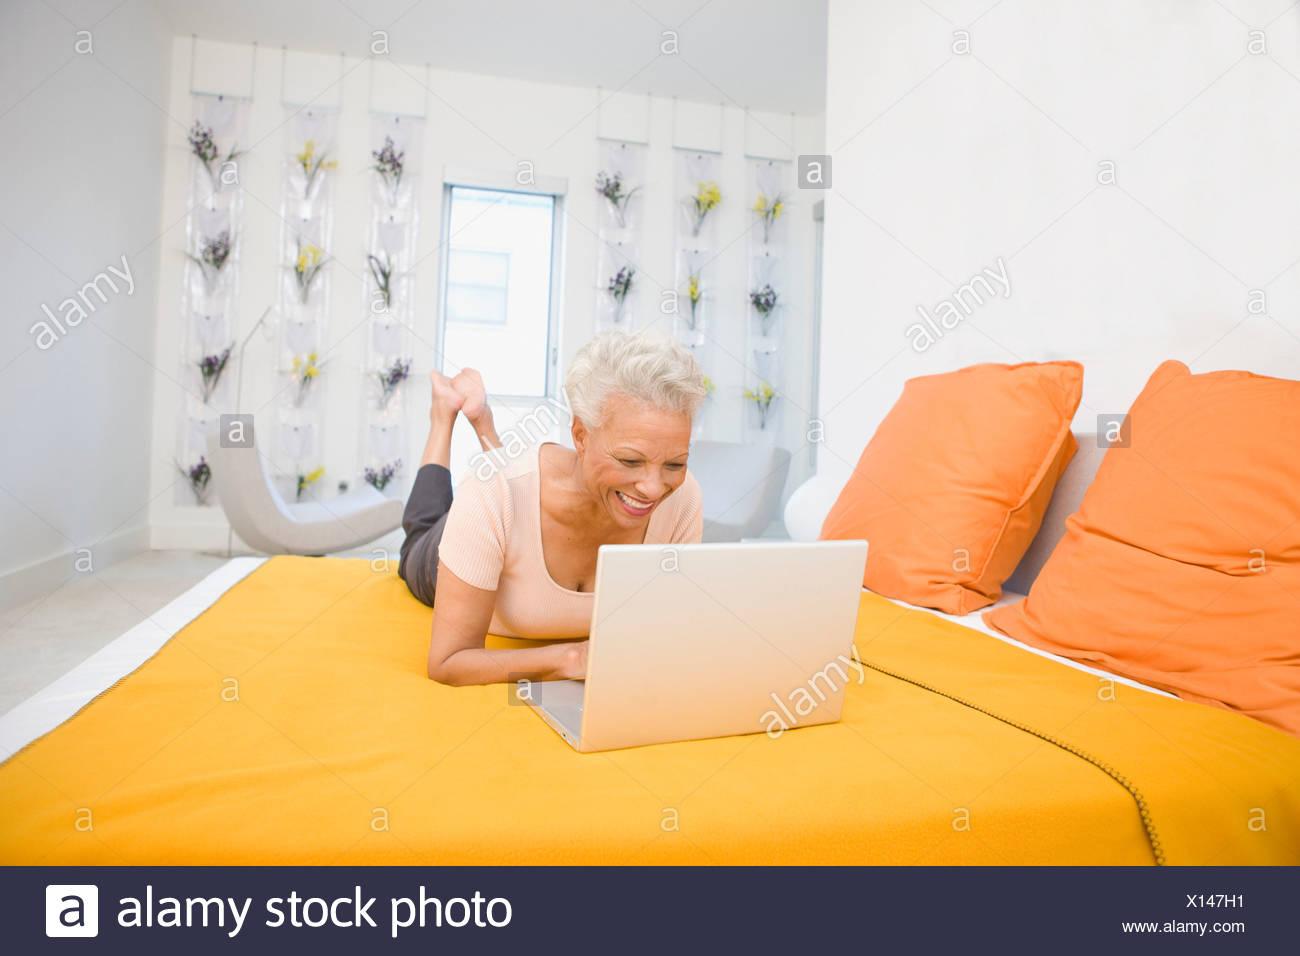 Frau mit Laptop am Bett Stockbild